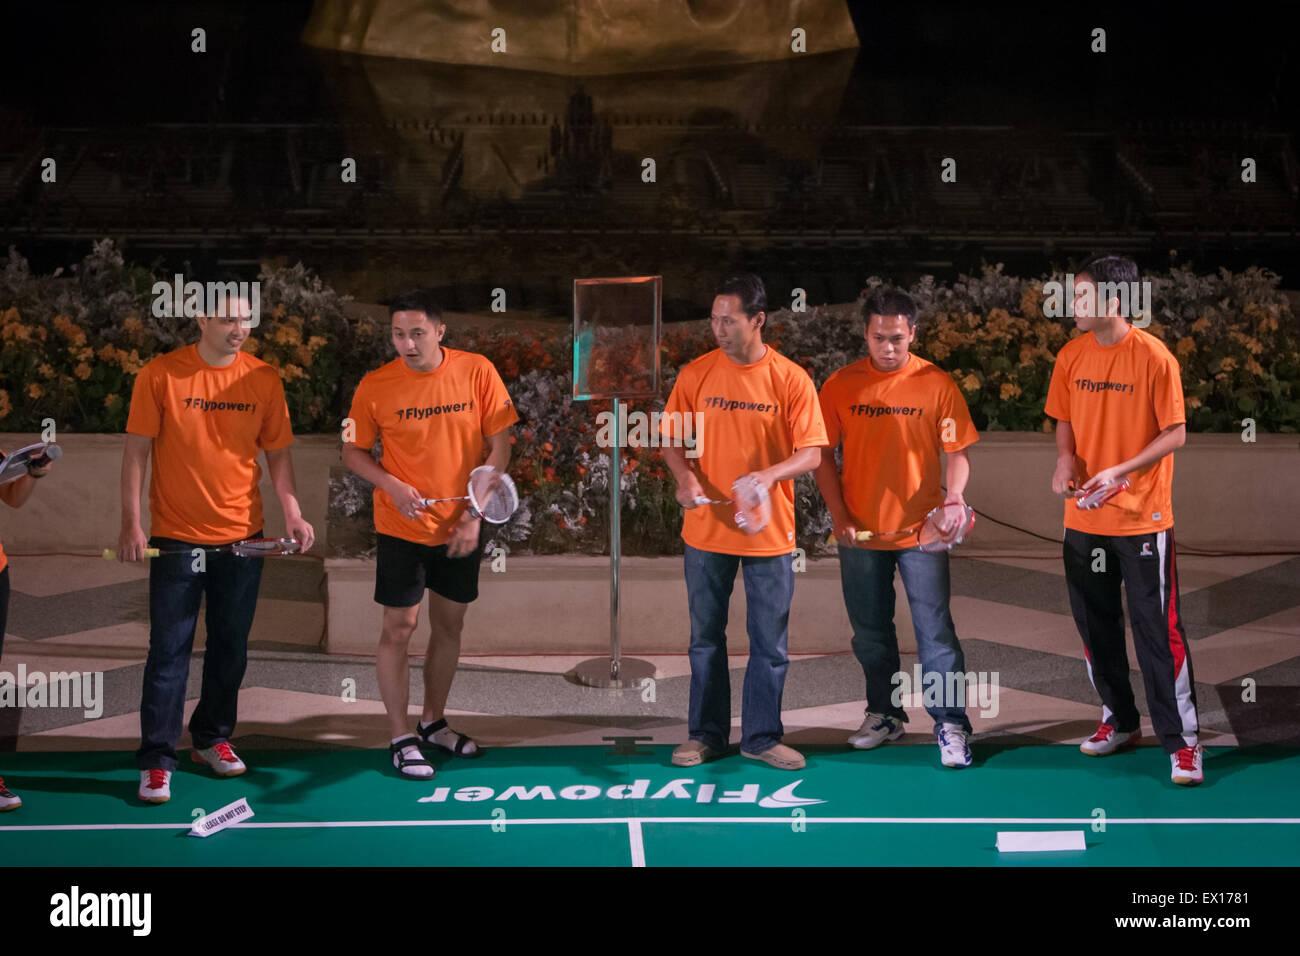 Badminton indonesio leyendas Haryanto Arbi, Ricky Subagja, Sigit Budiarto, Markis Kido y Hendra Setiawan durante Imagen De Stock